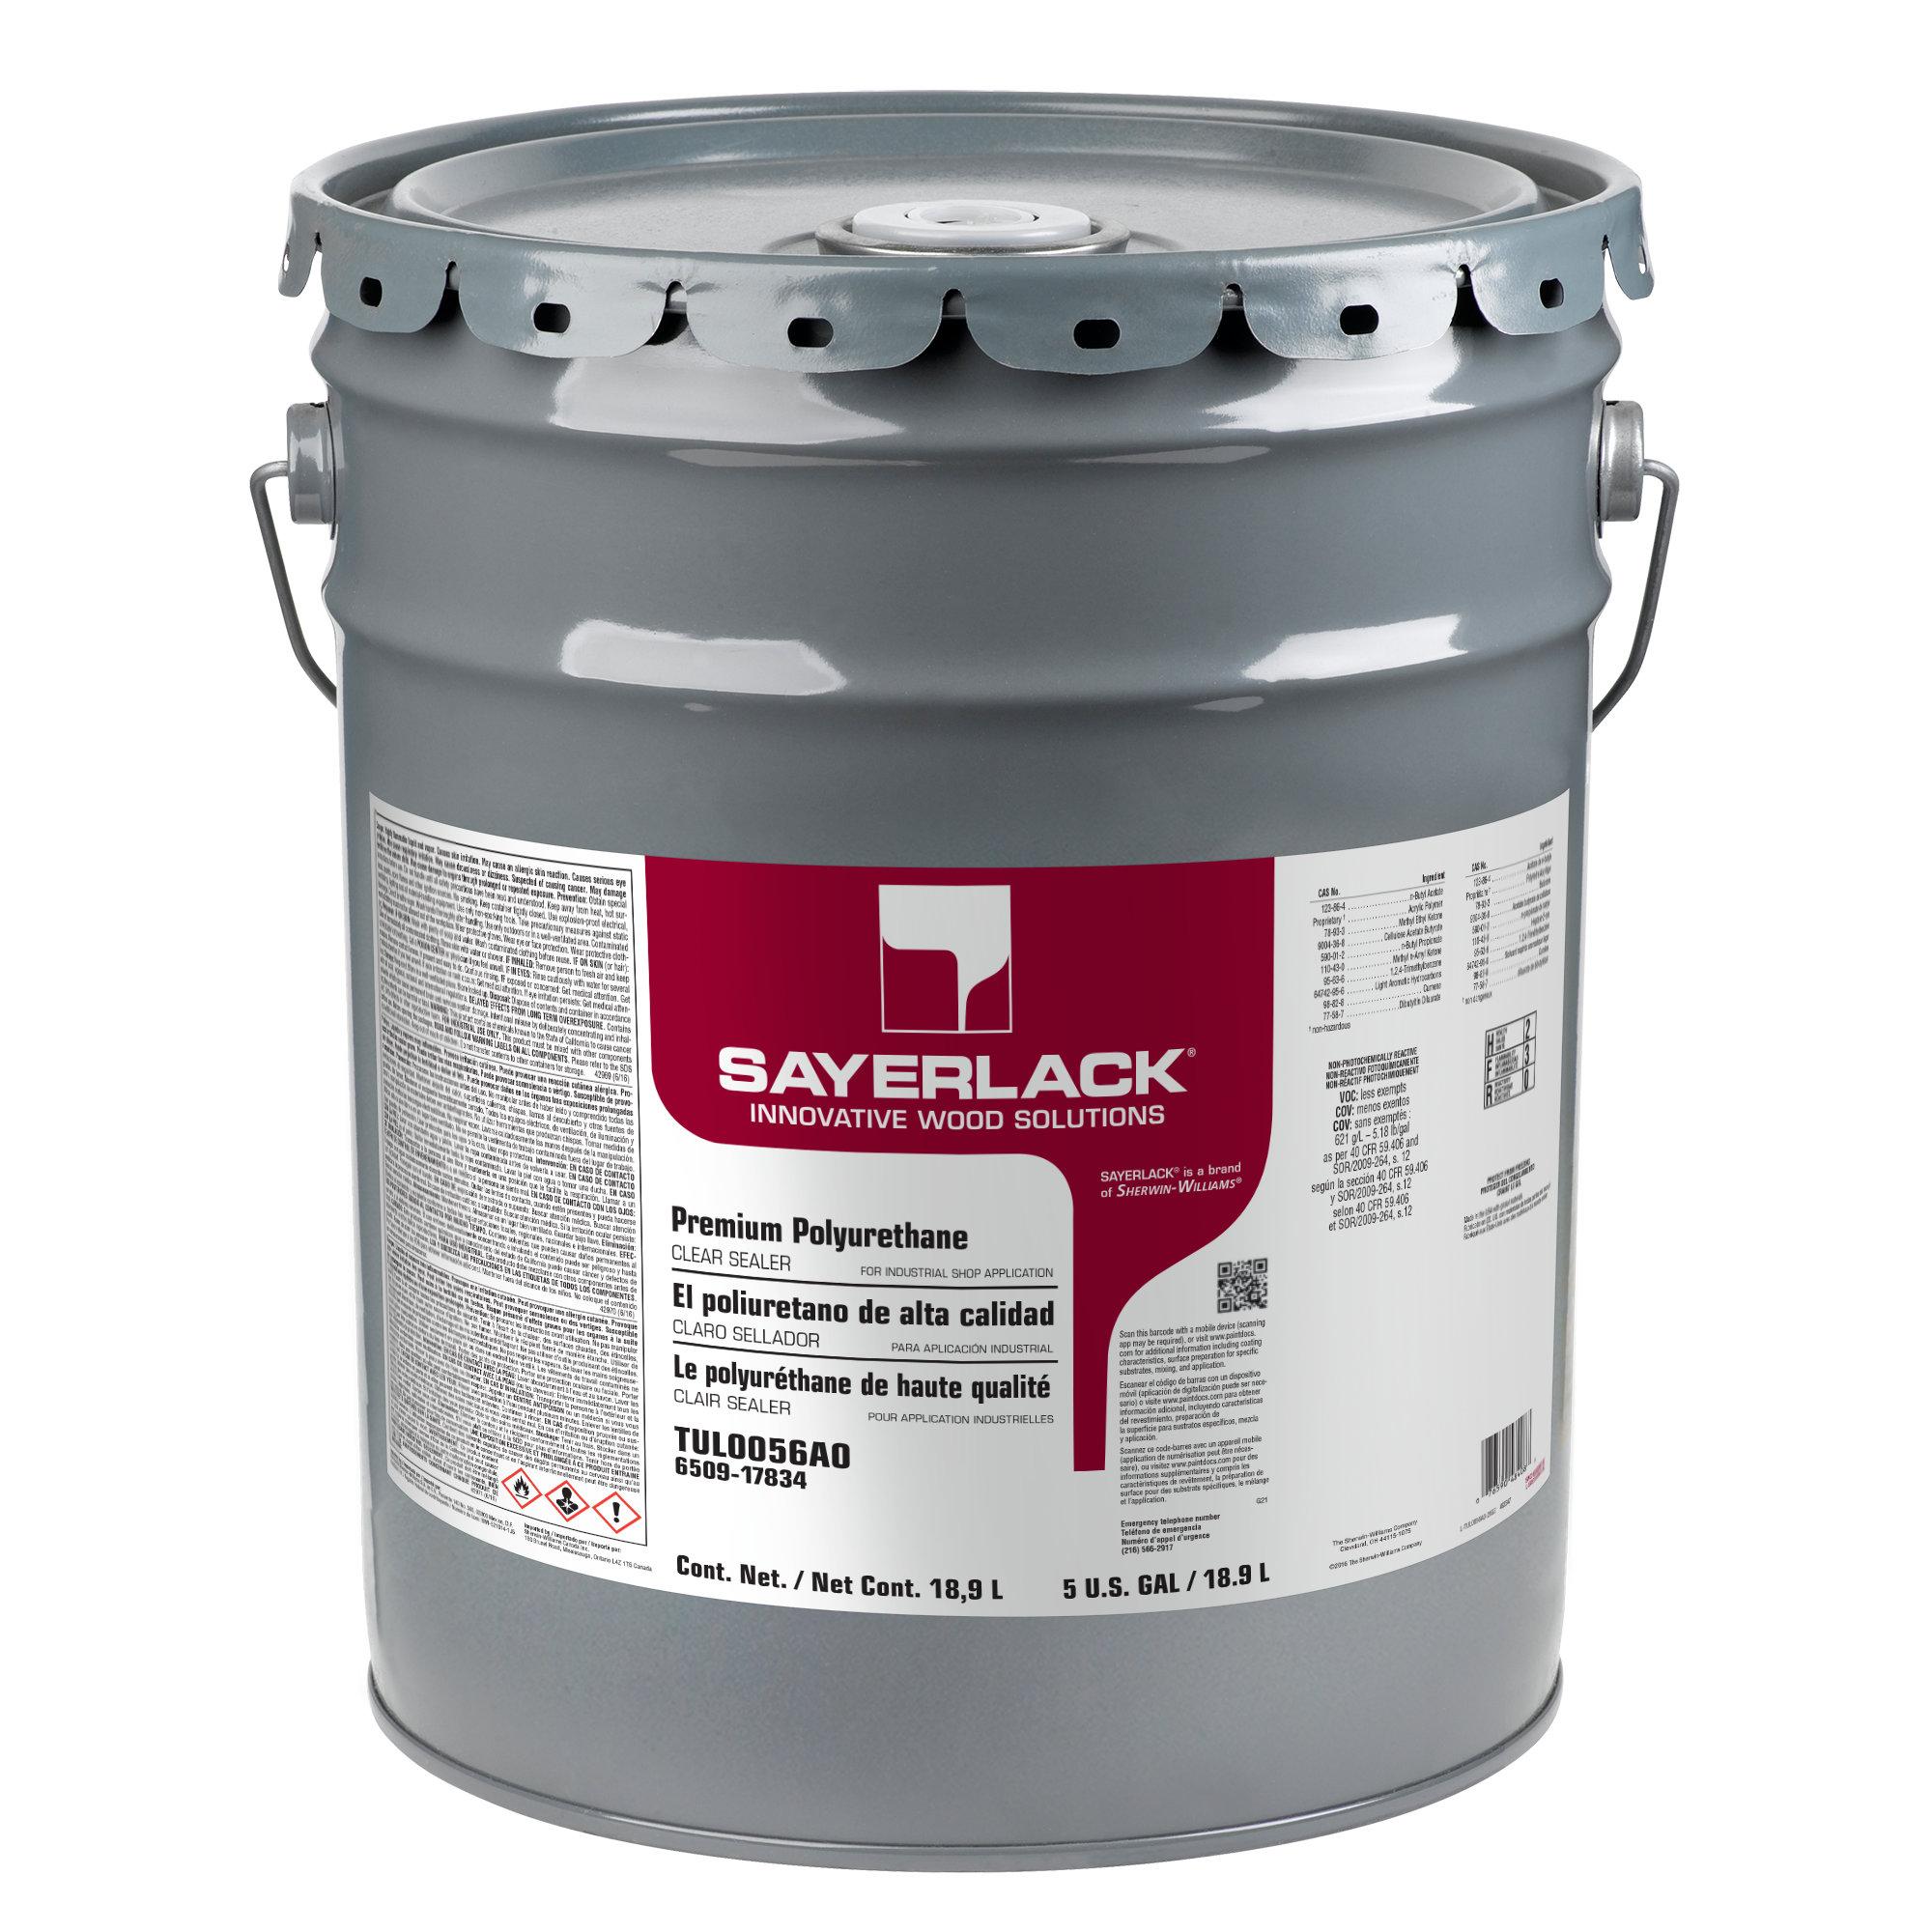 Sayerlack Premium Polyurethane Clear Sealer Sherwin Williams